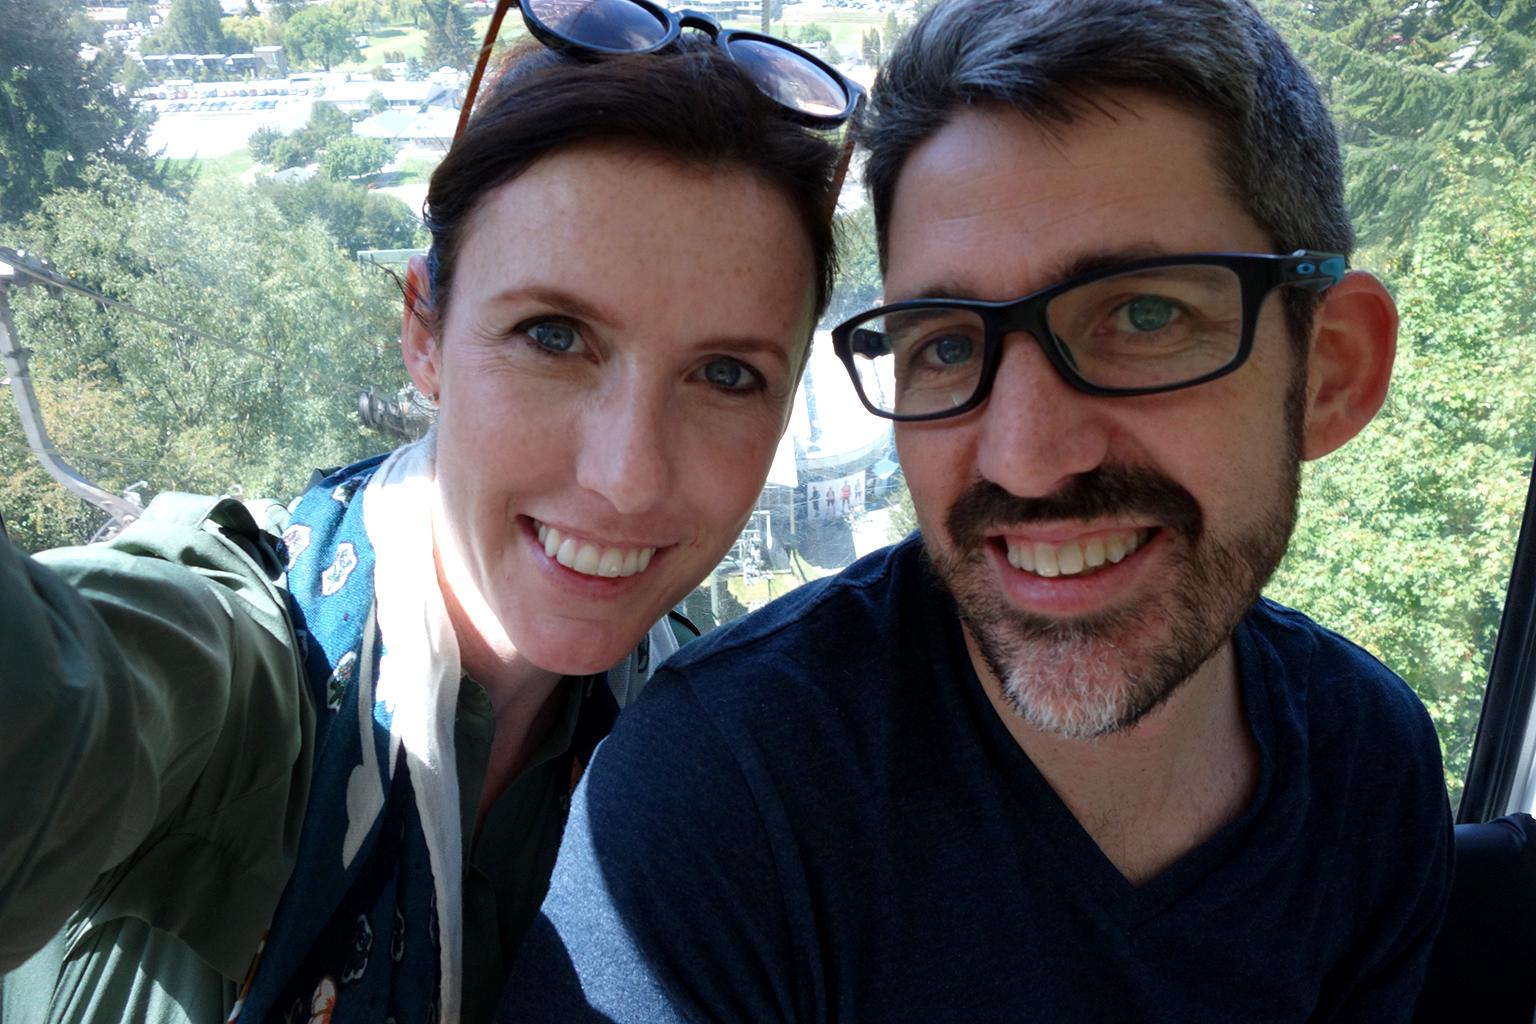 Taking the Skyline Gondola in NZ